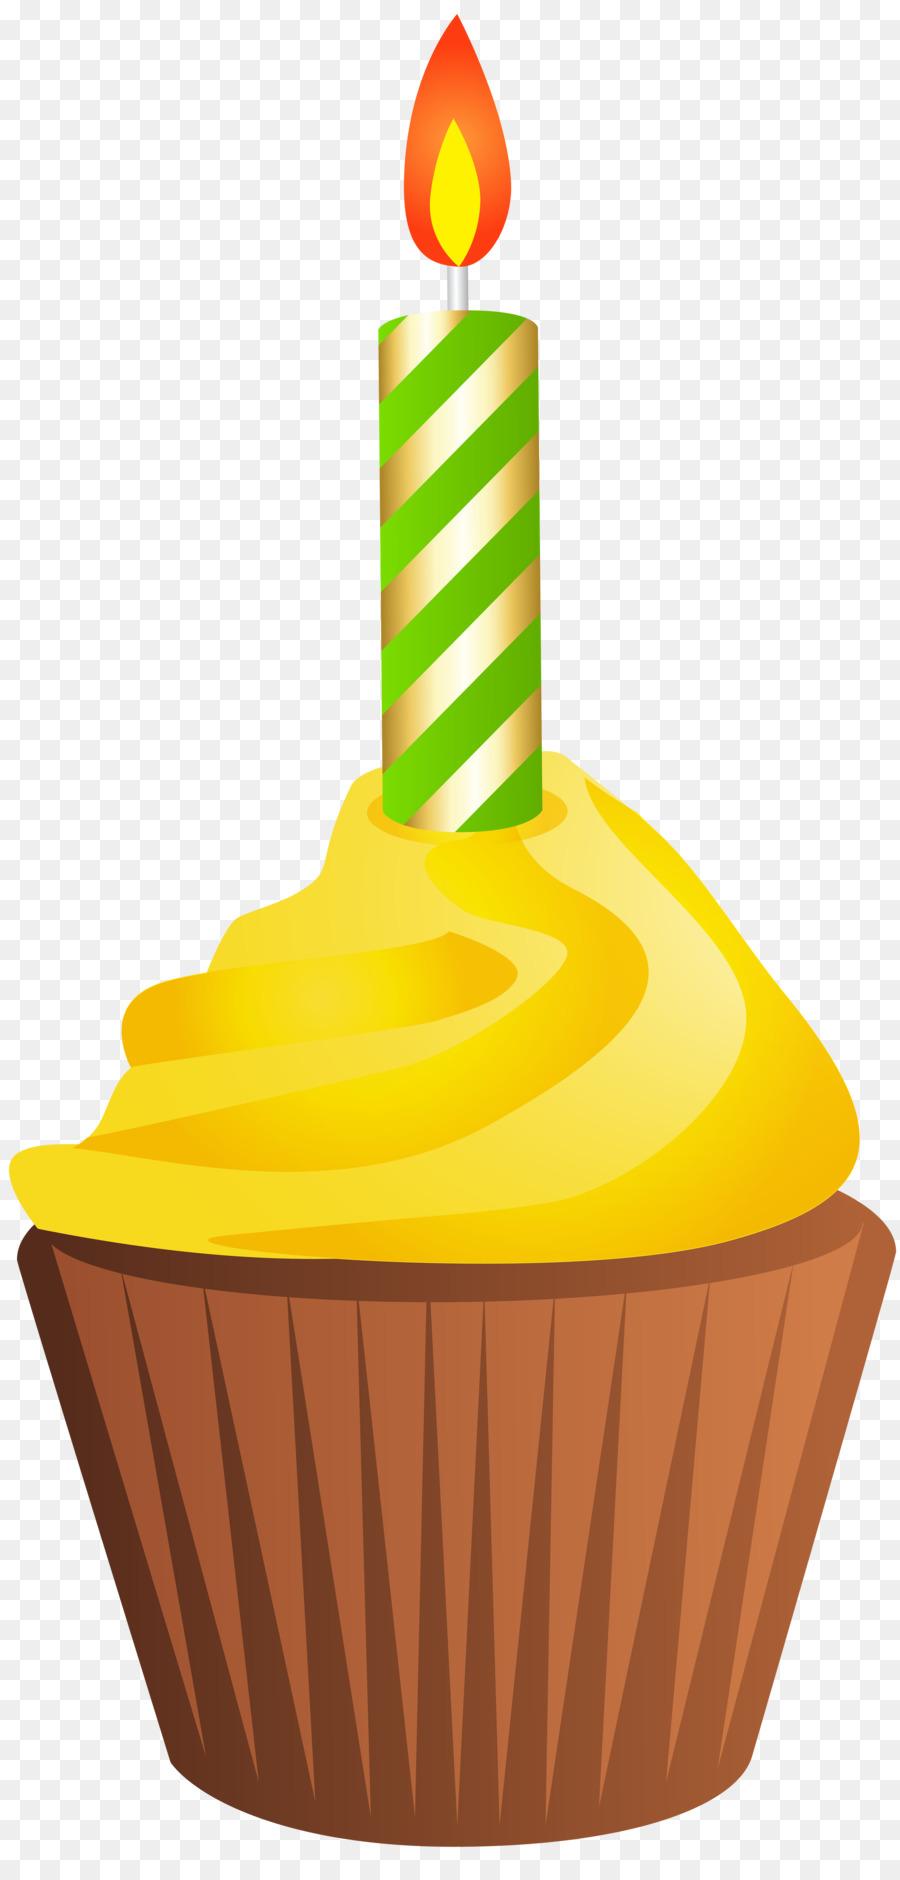 1 year cupcake transparent clipart clip art royalty free Birthday Cake Cartoon clipart - Cupcake, Cake, Candle, transparent ... clip art royalty free